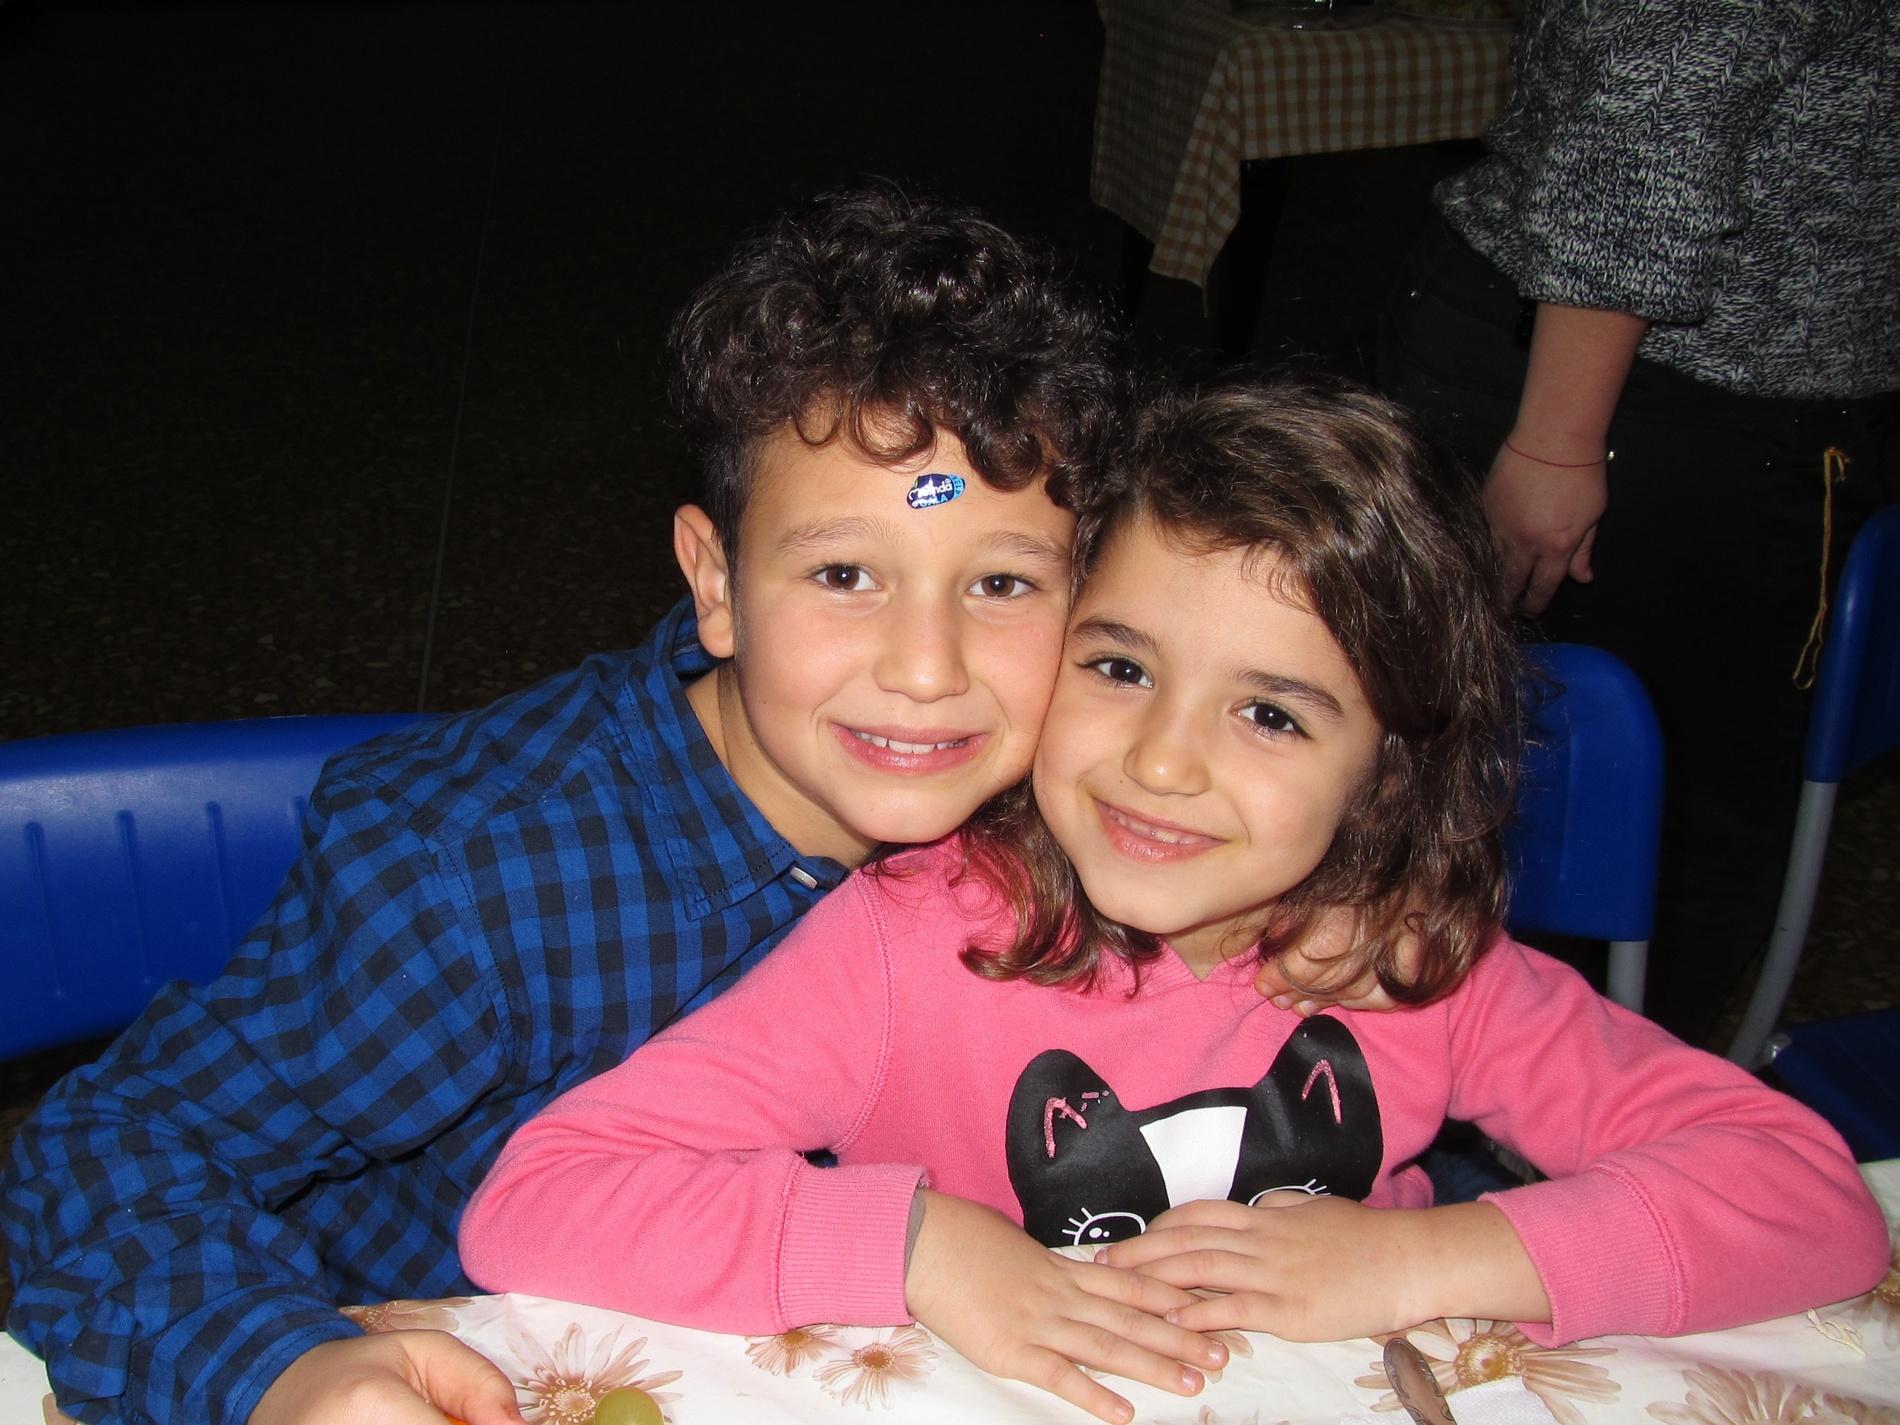 cena-famiglie-catechismo-2015-12-05-20-56-01